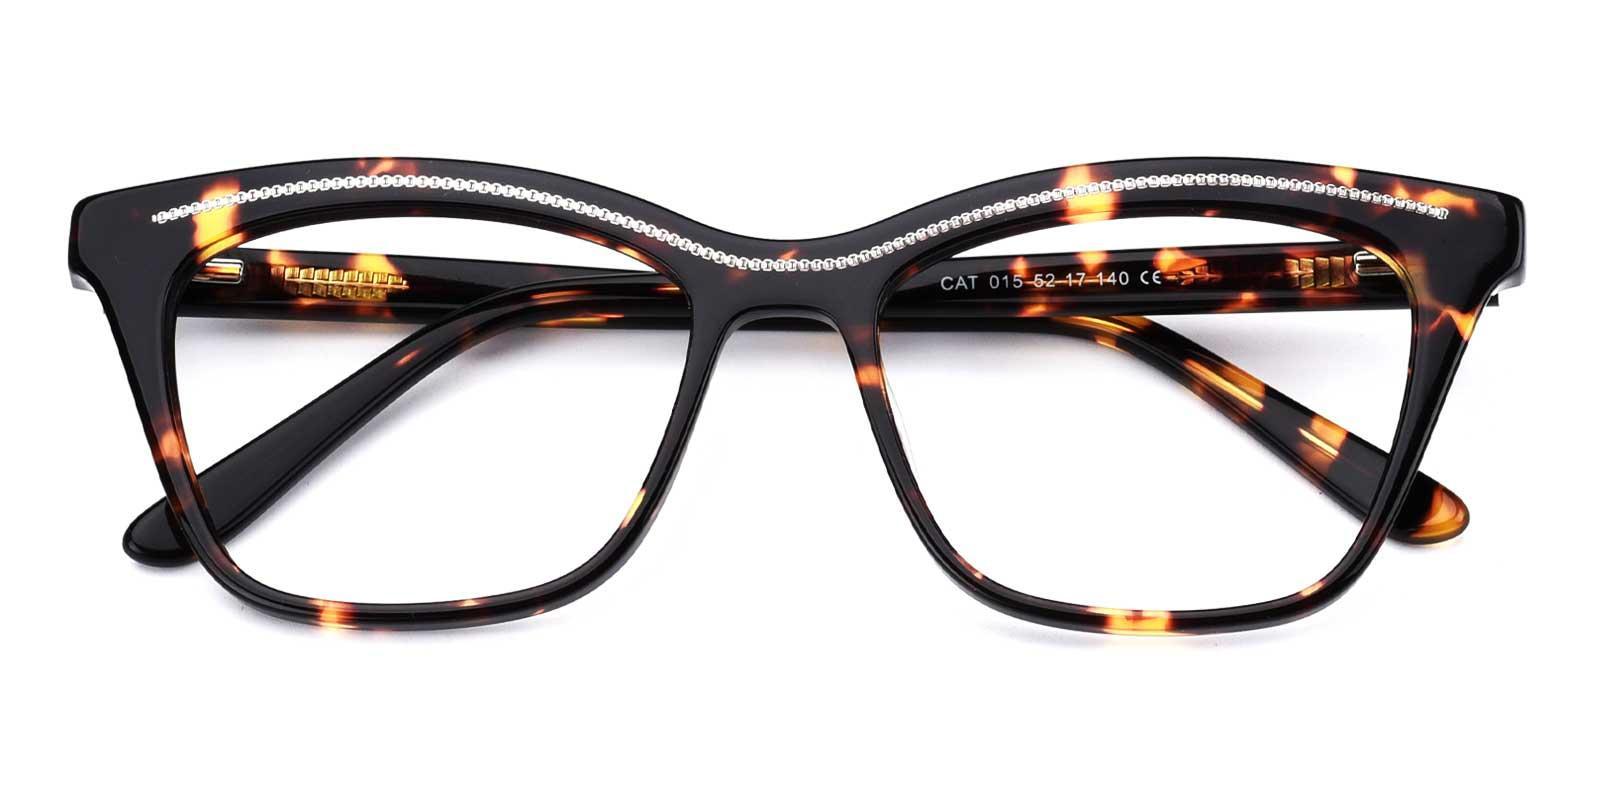 Tina-Tortoise-Browline-Acetate-Eyeglasses-detail